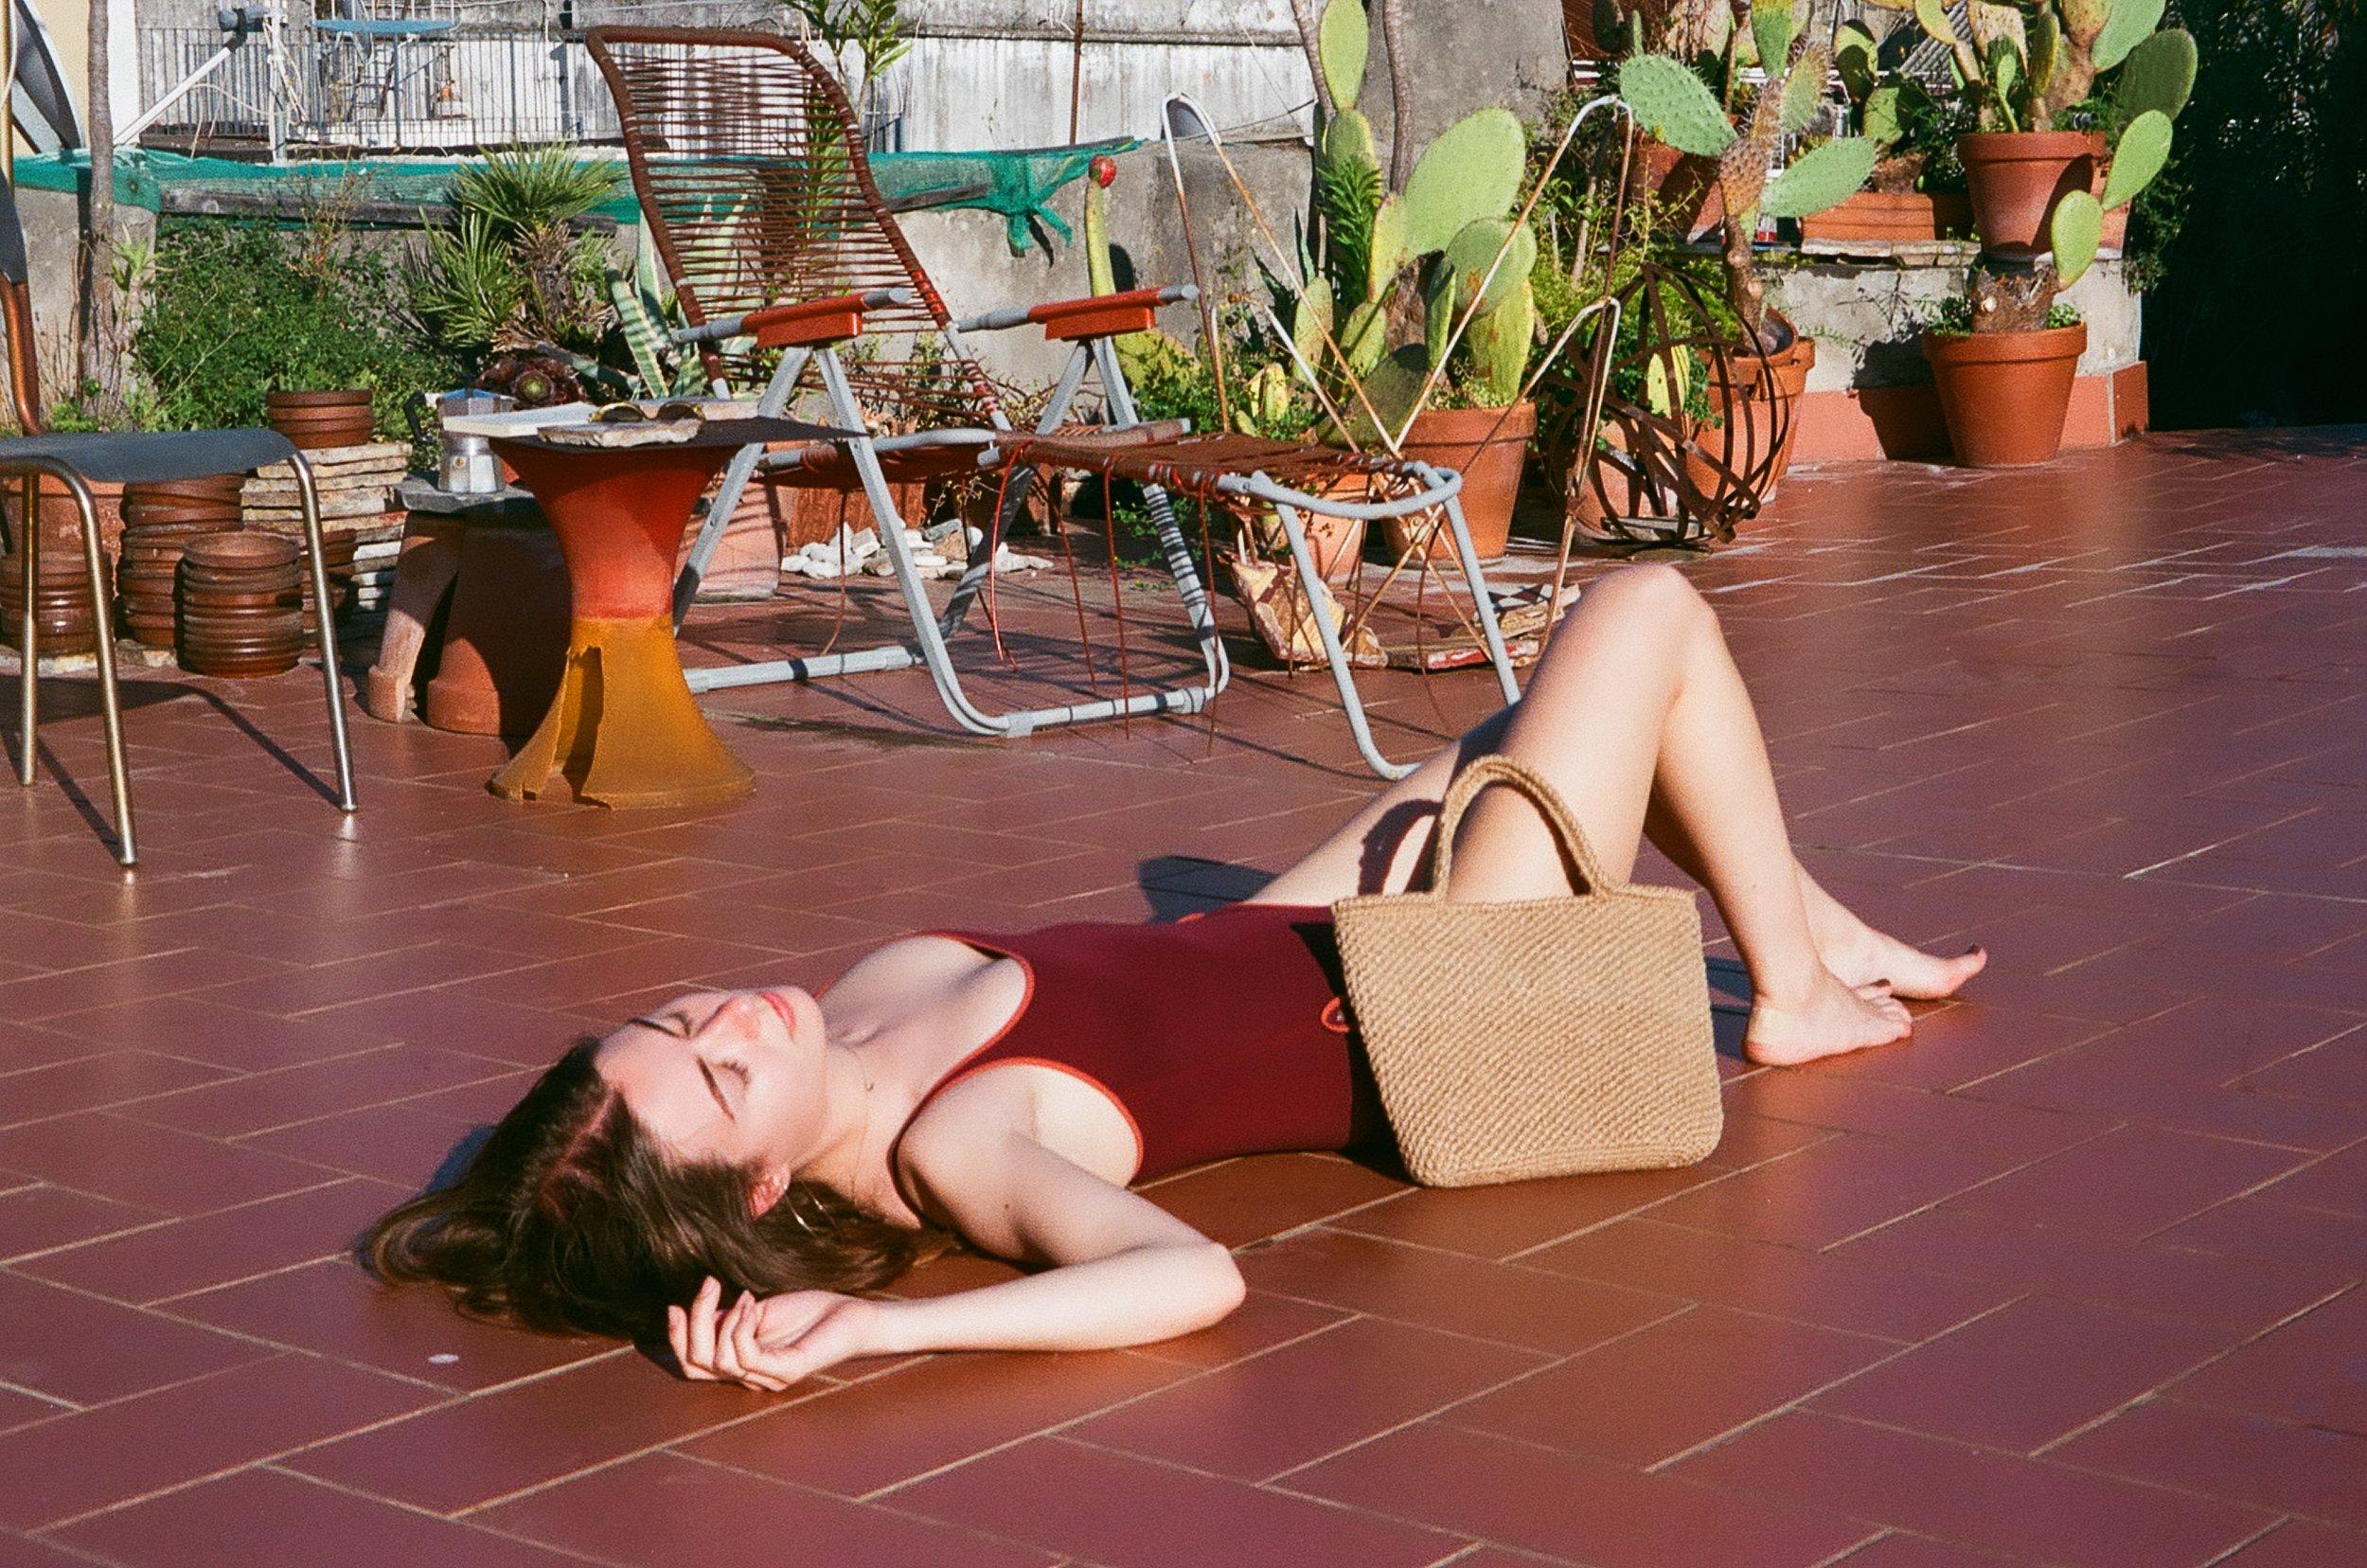 napoli travel italy mediterranean sea beach summer vacay vacation euro european textiles bags jute crochet